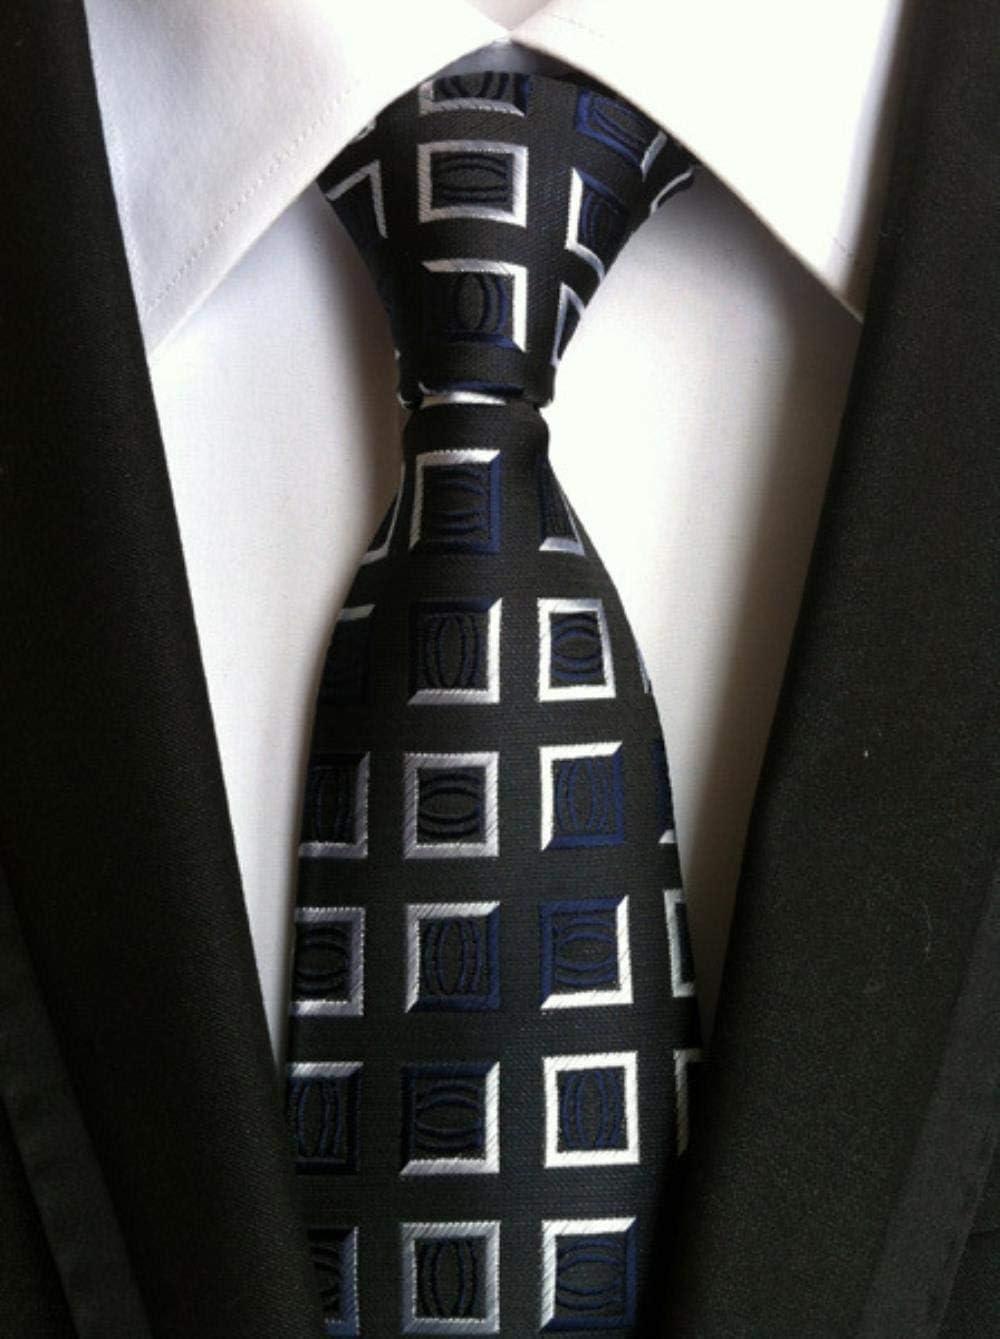 Salida De Fábrica VLOU 18 Colors 8cm Silk Necktie for Man Plaid&Striped GeometricTies Man'S Wedding Party Necktie,LHX-15 Lhx-11 NosxWI